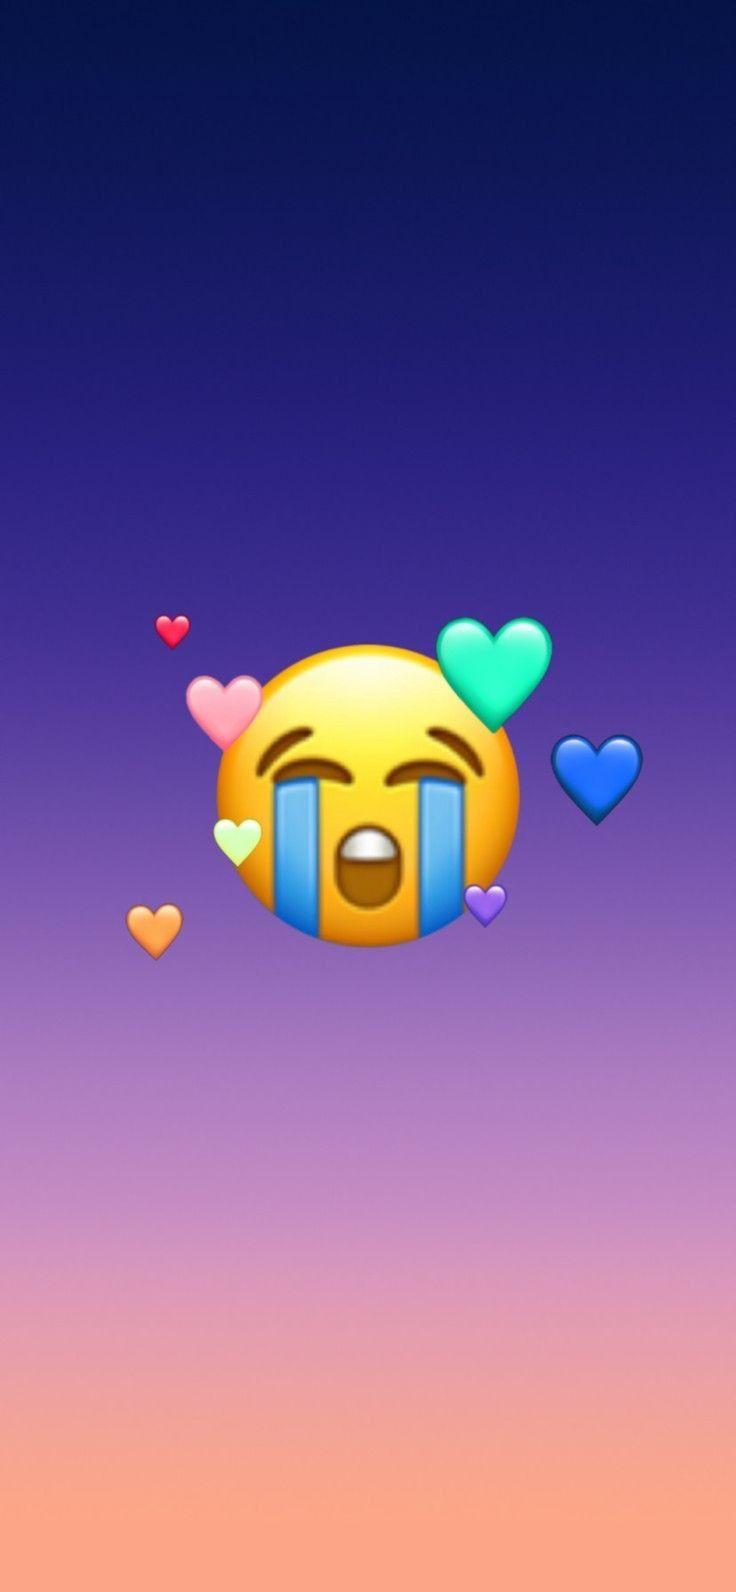 Notitle Maquillaje Makeup Wallpaper Iphone Cute Cute Emoji Wallpaper Emoji Wallpaper